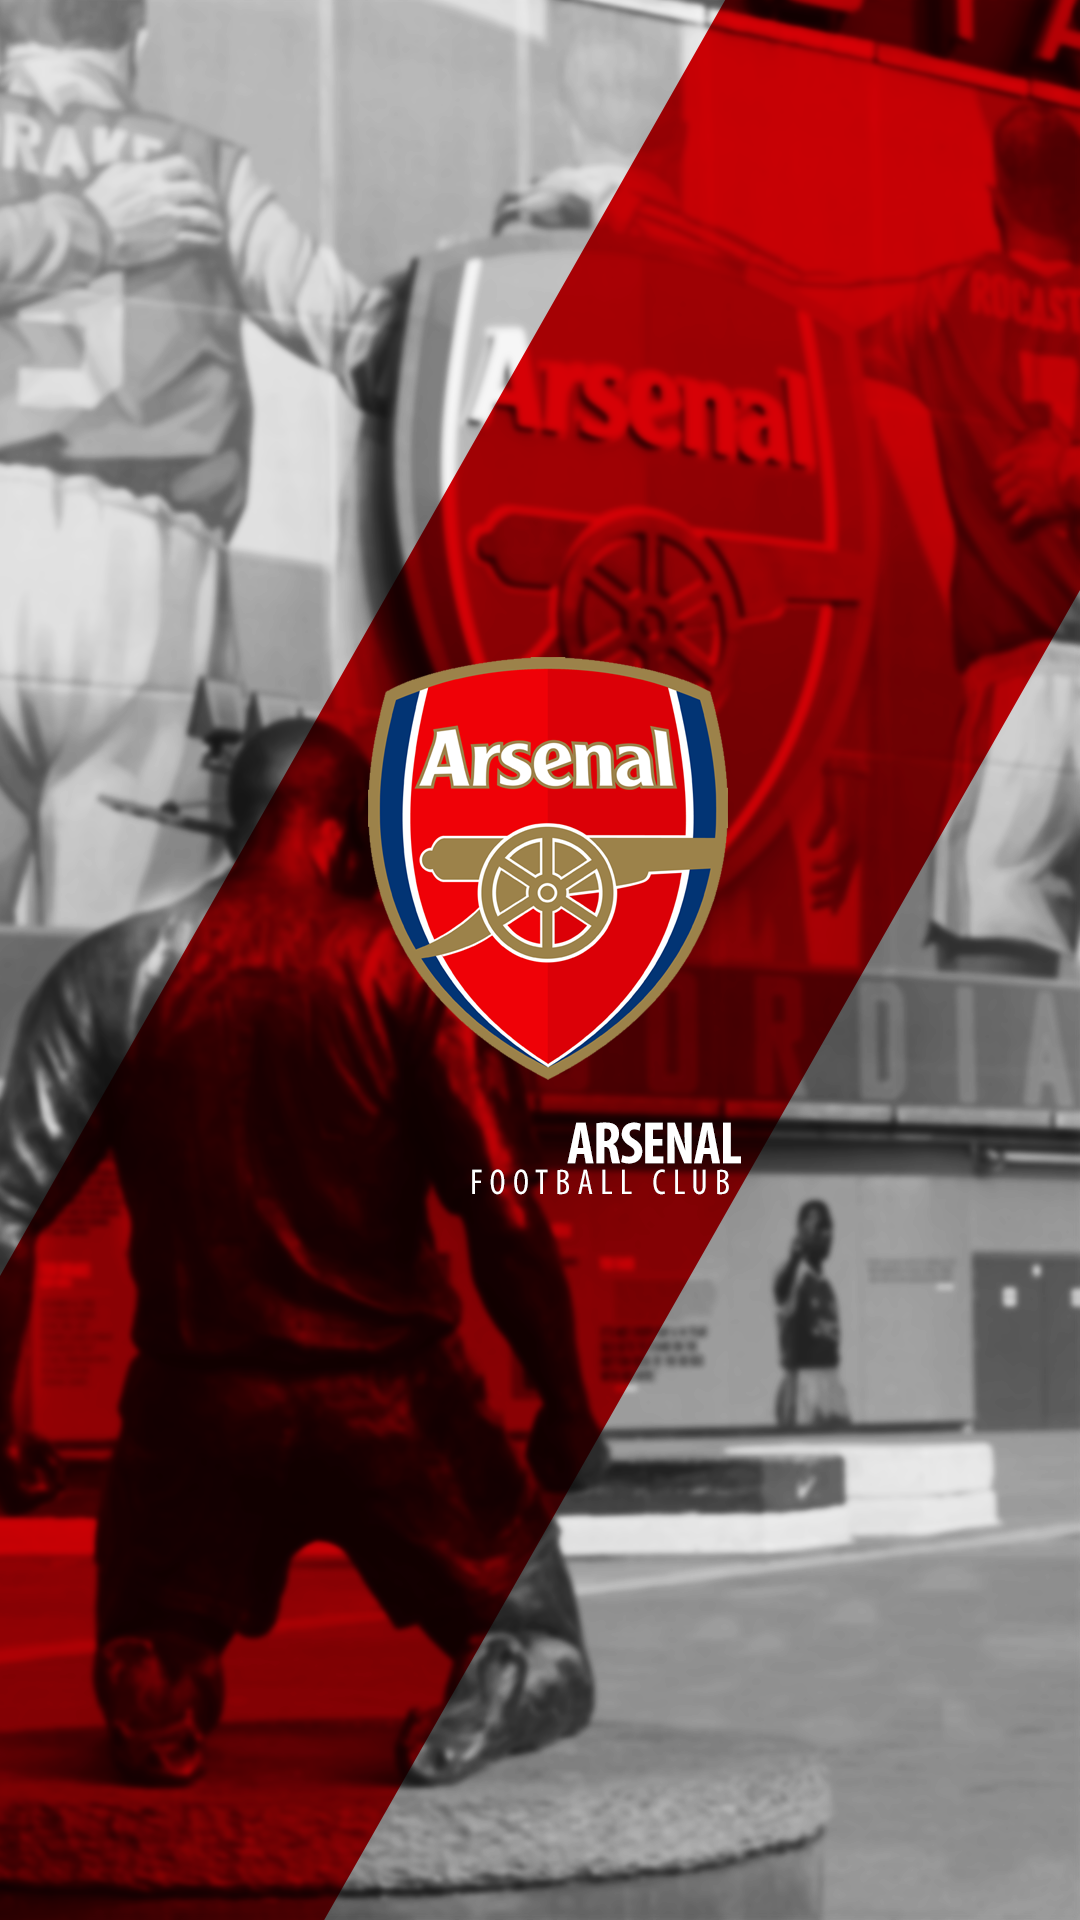 Free Arsenal Desktop Image Jogadores de futebol, Futebol